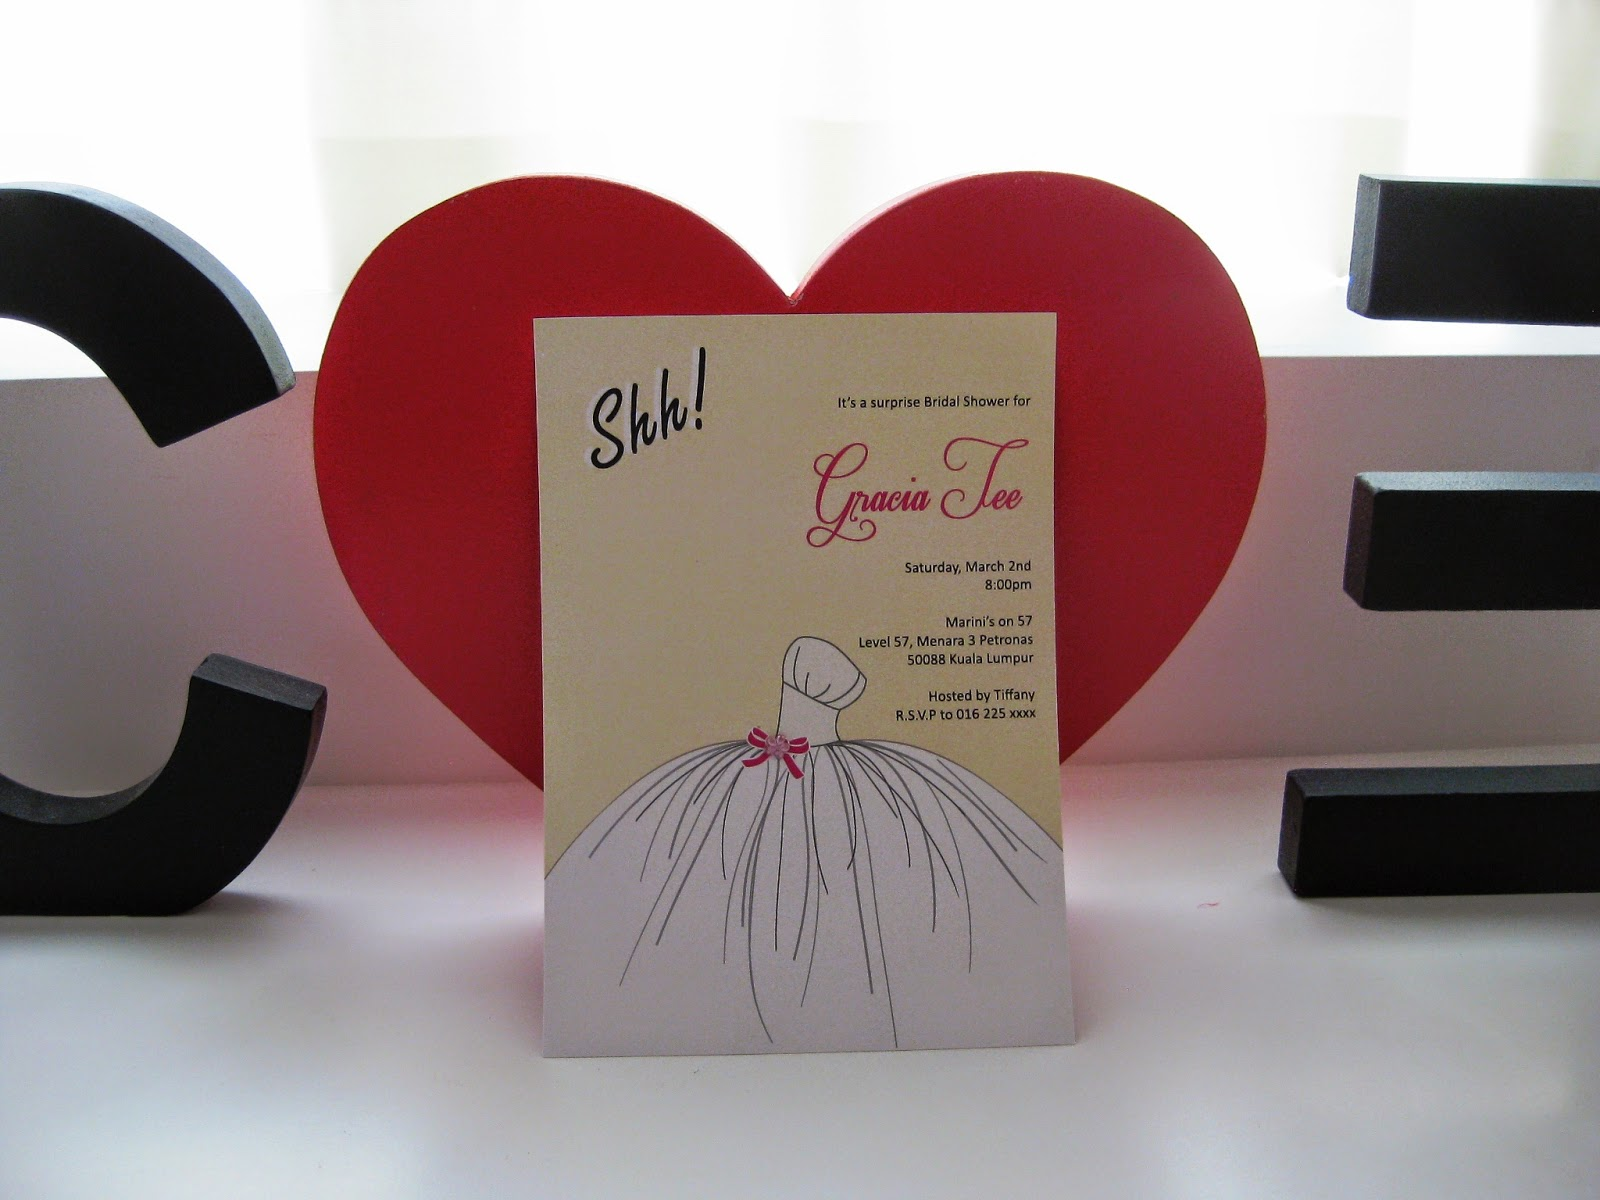 Wedding Invitations and Wedding Favors (www.invites.com.my)